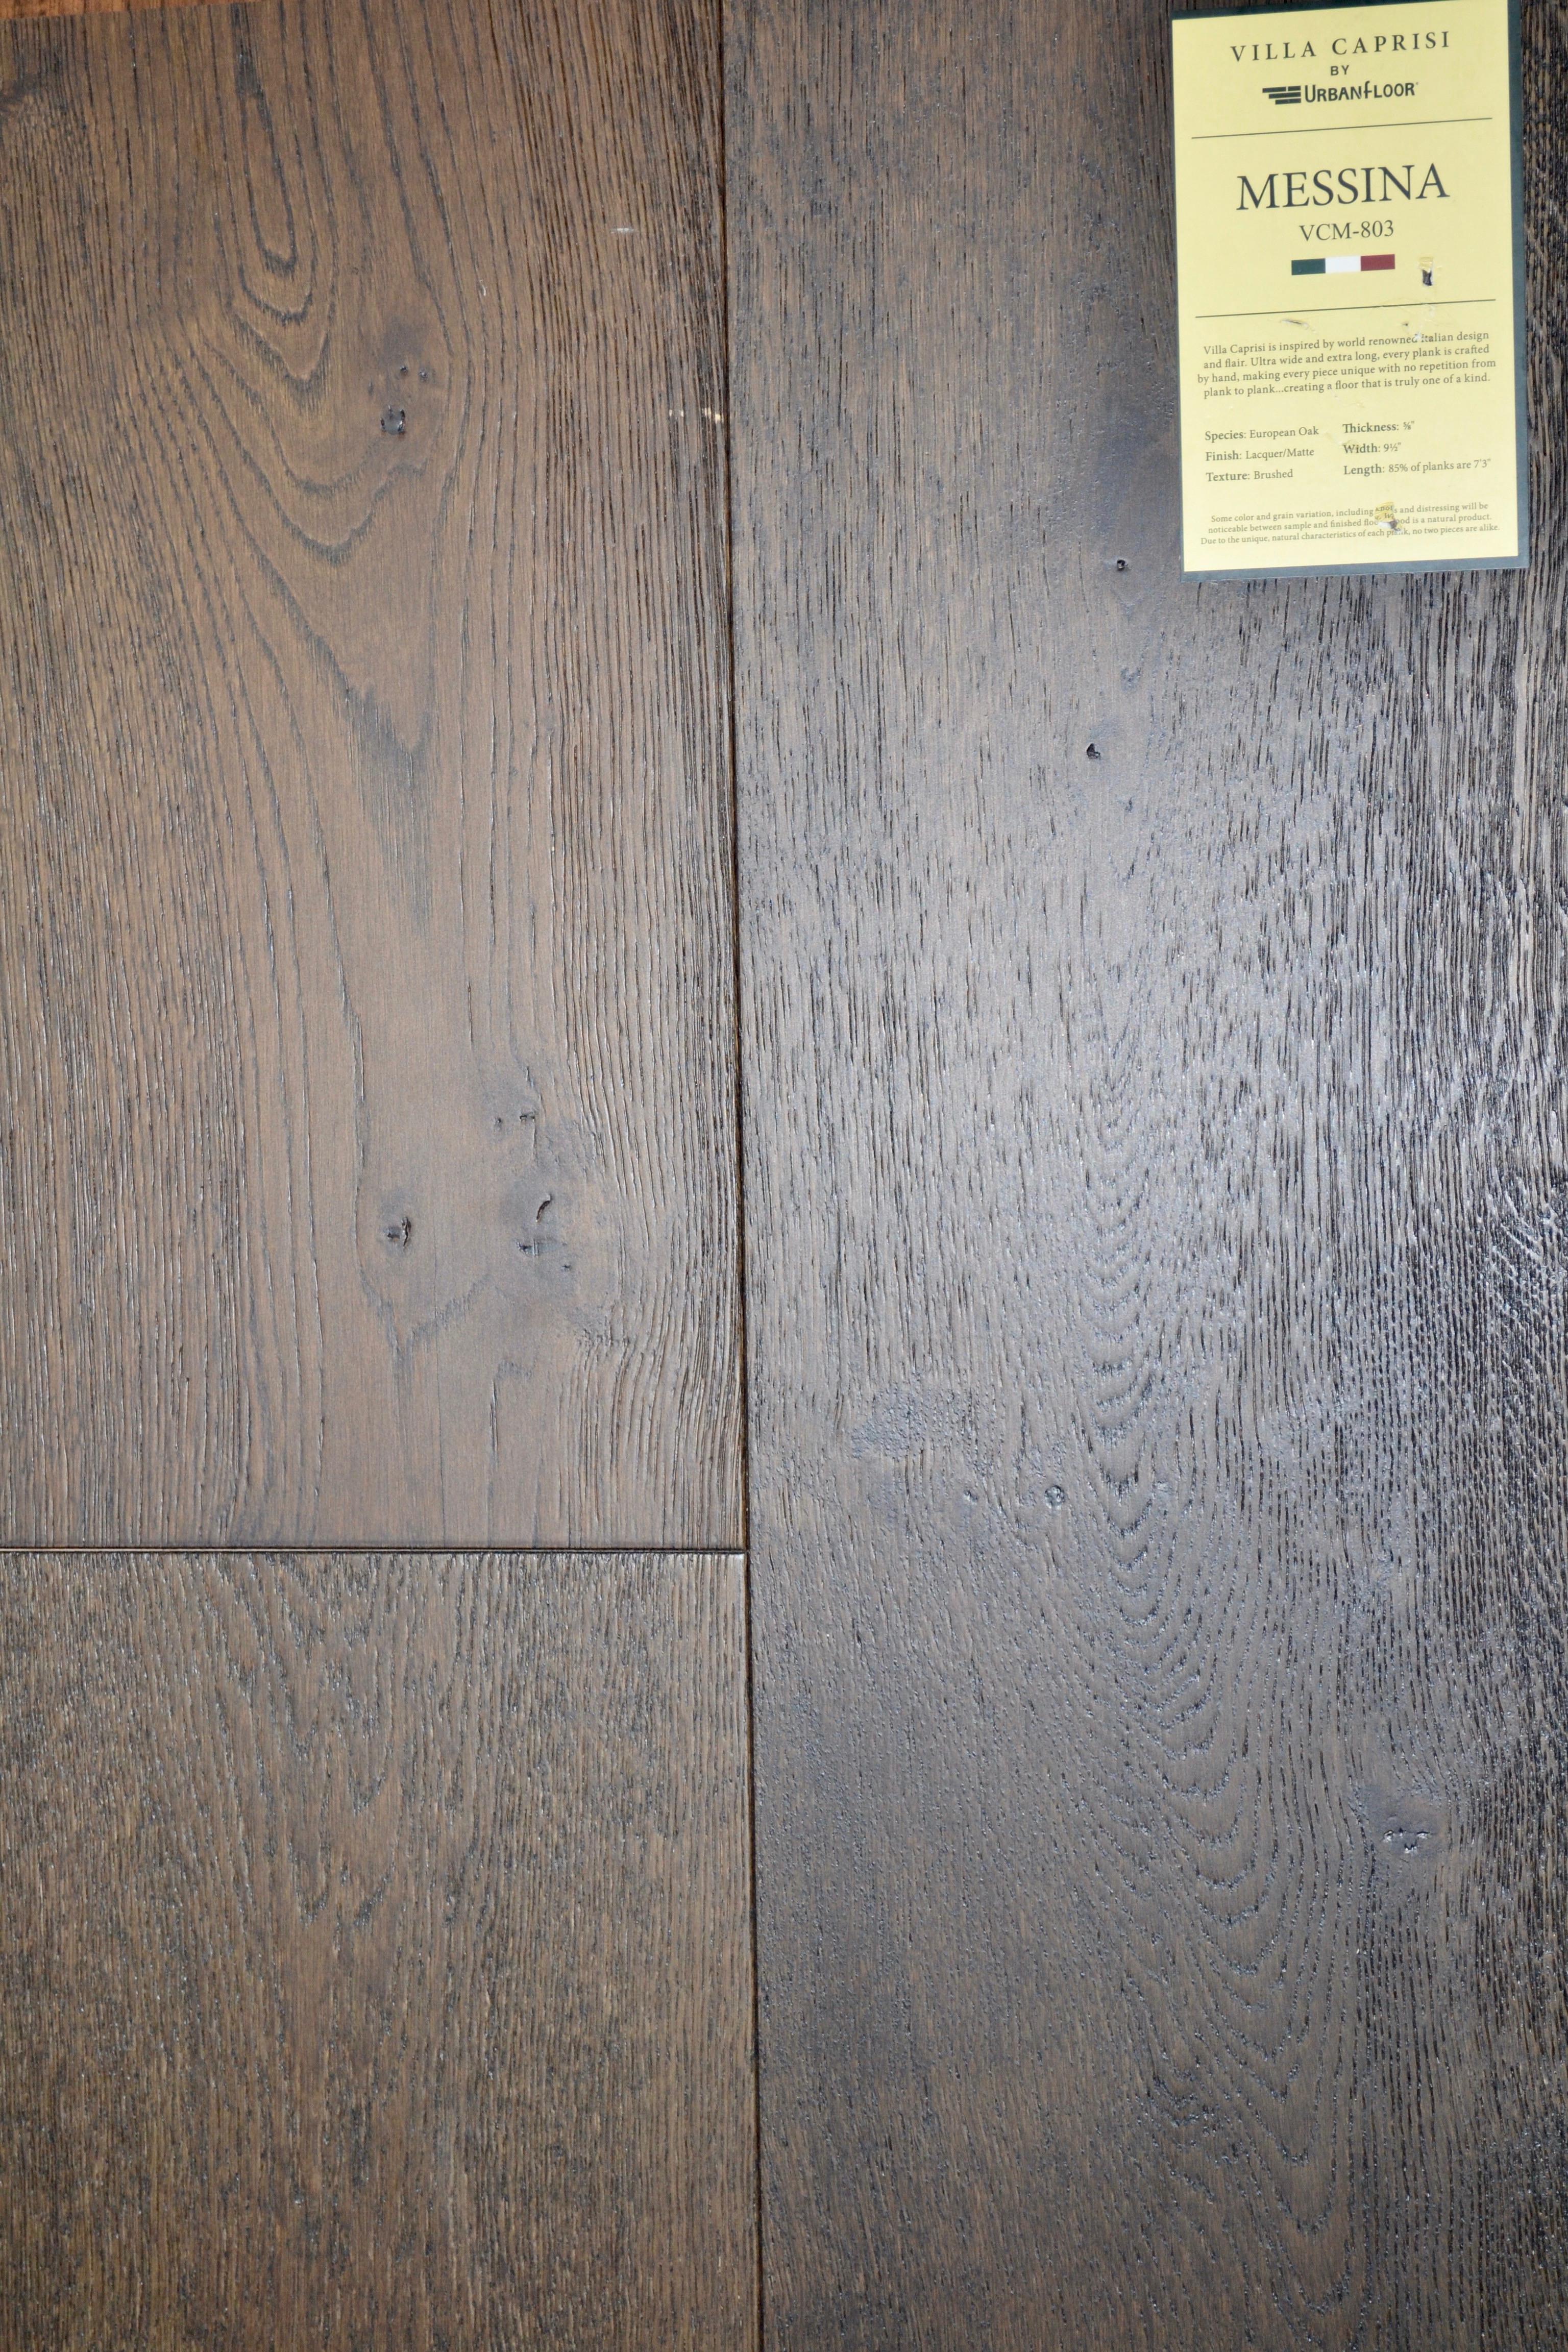 hickory hardwood flooring colors of villa caprisi fine european hardwood millennium hardwood for european style inspired designer oak floor messina by villa caprisi